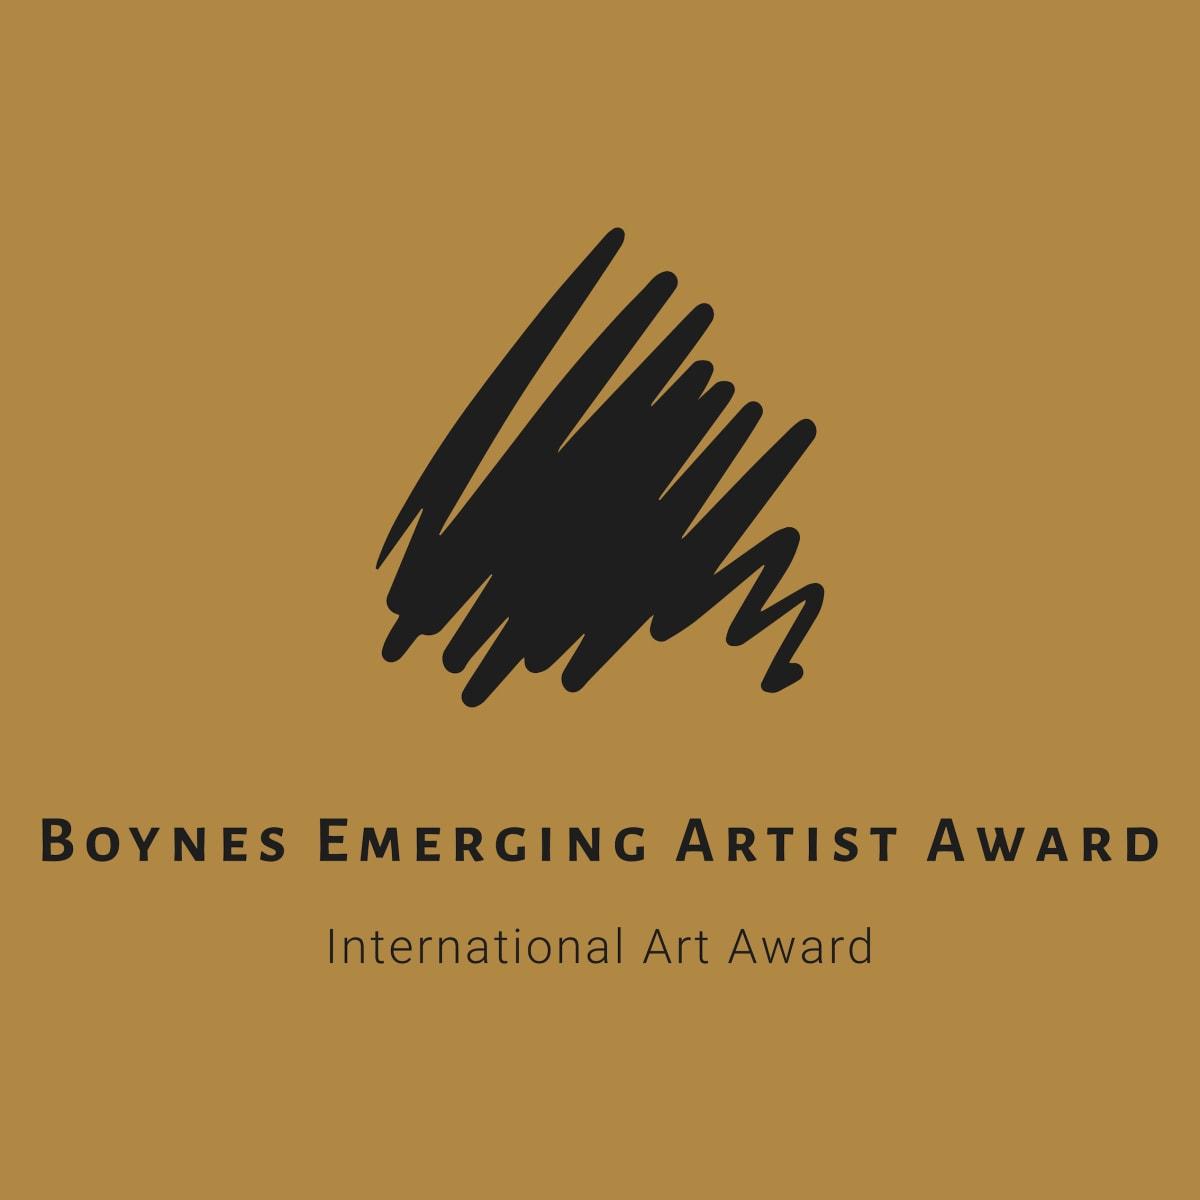 4th Edition Boynes Emerging Artist Award Artist Call Out